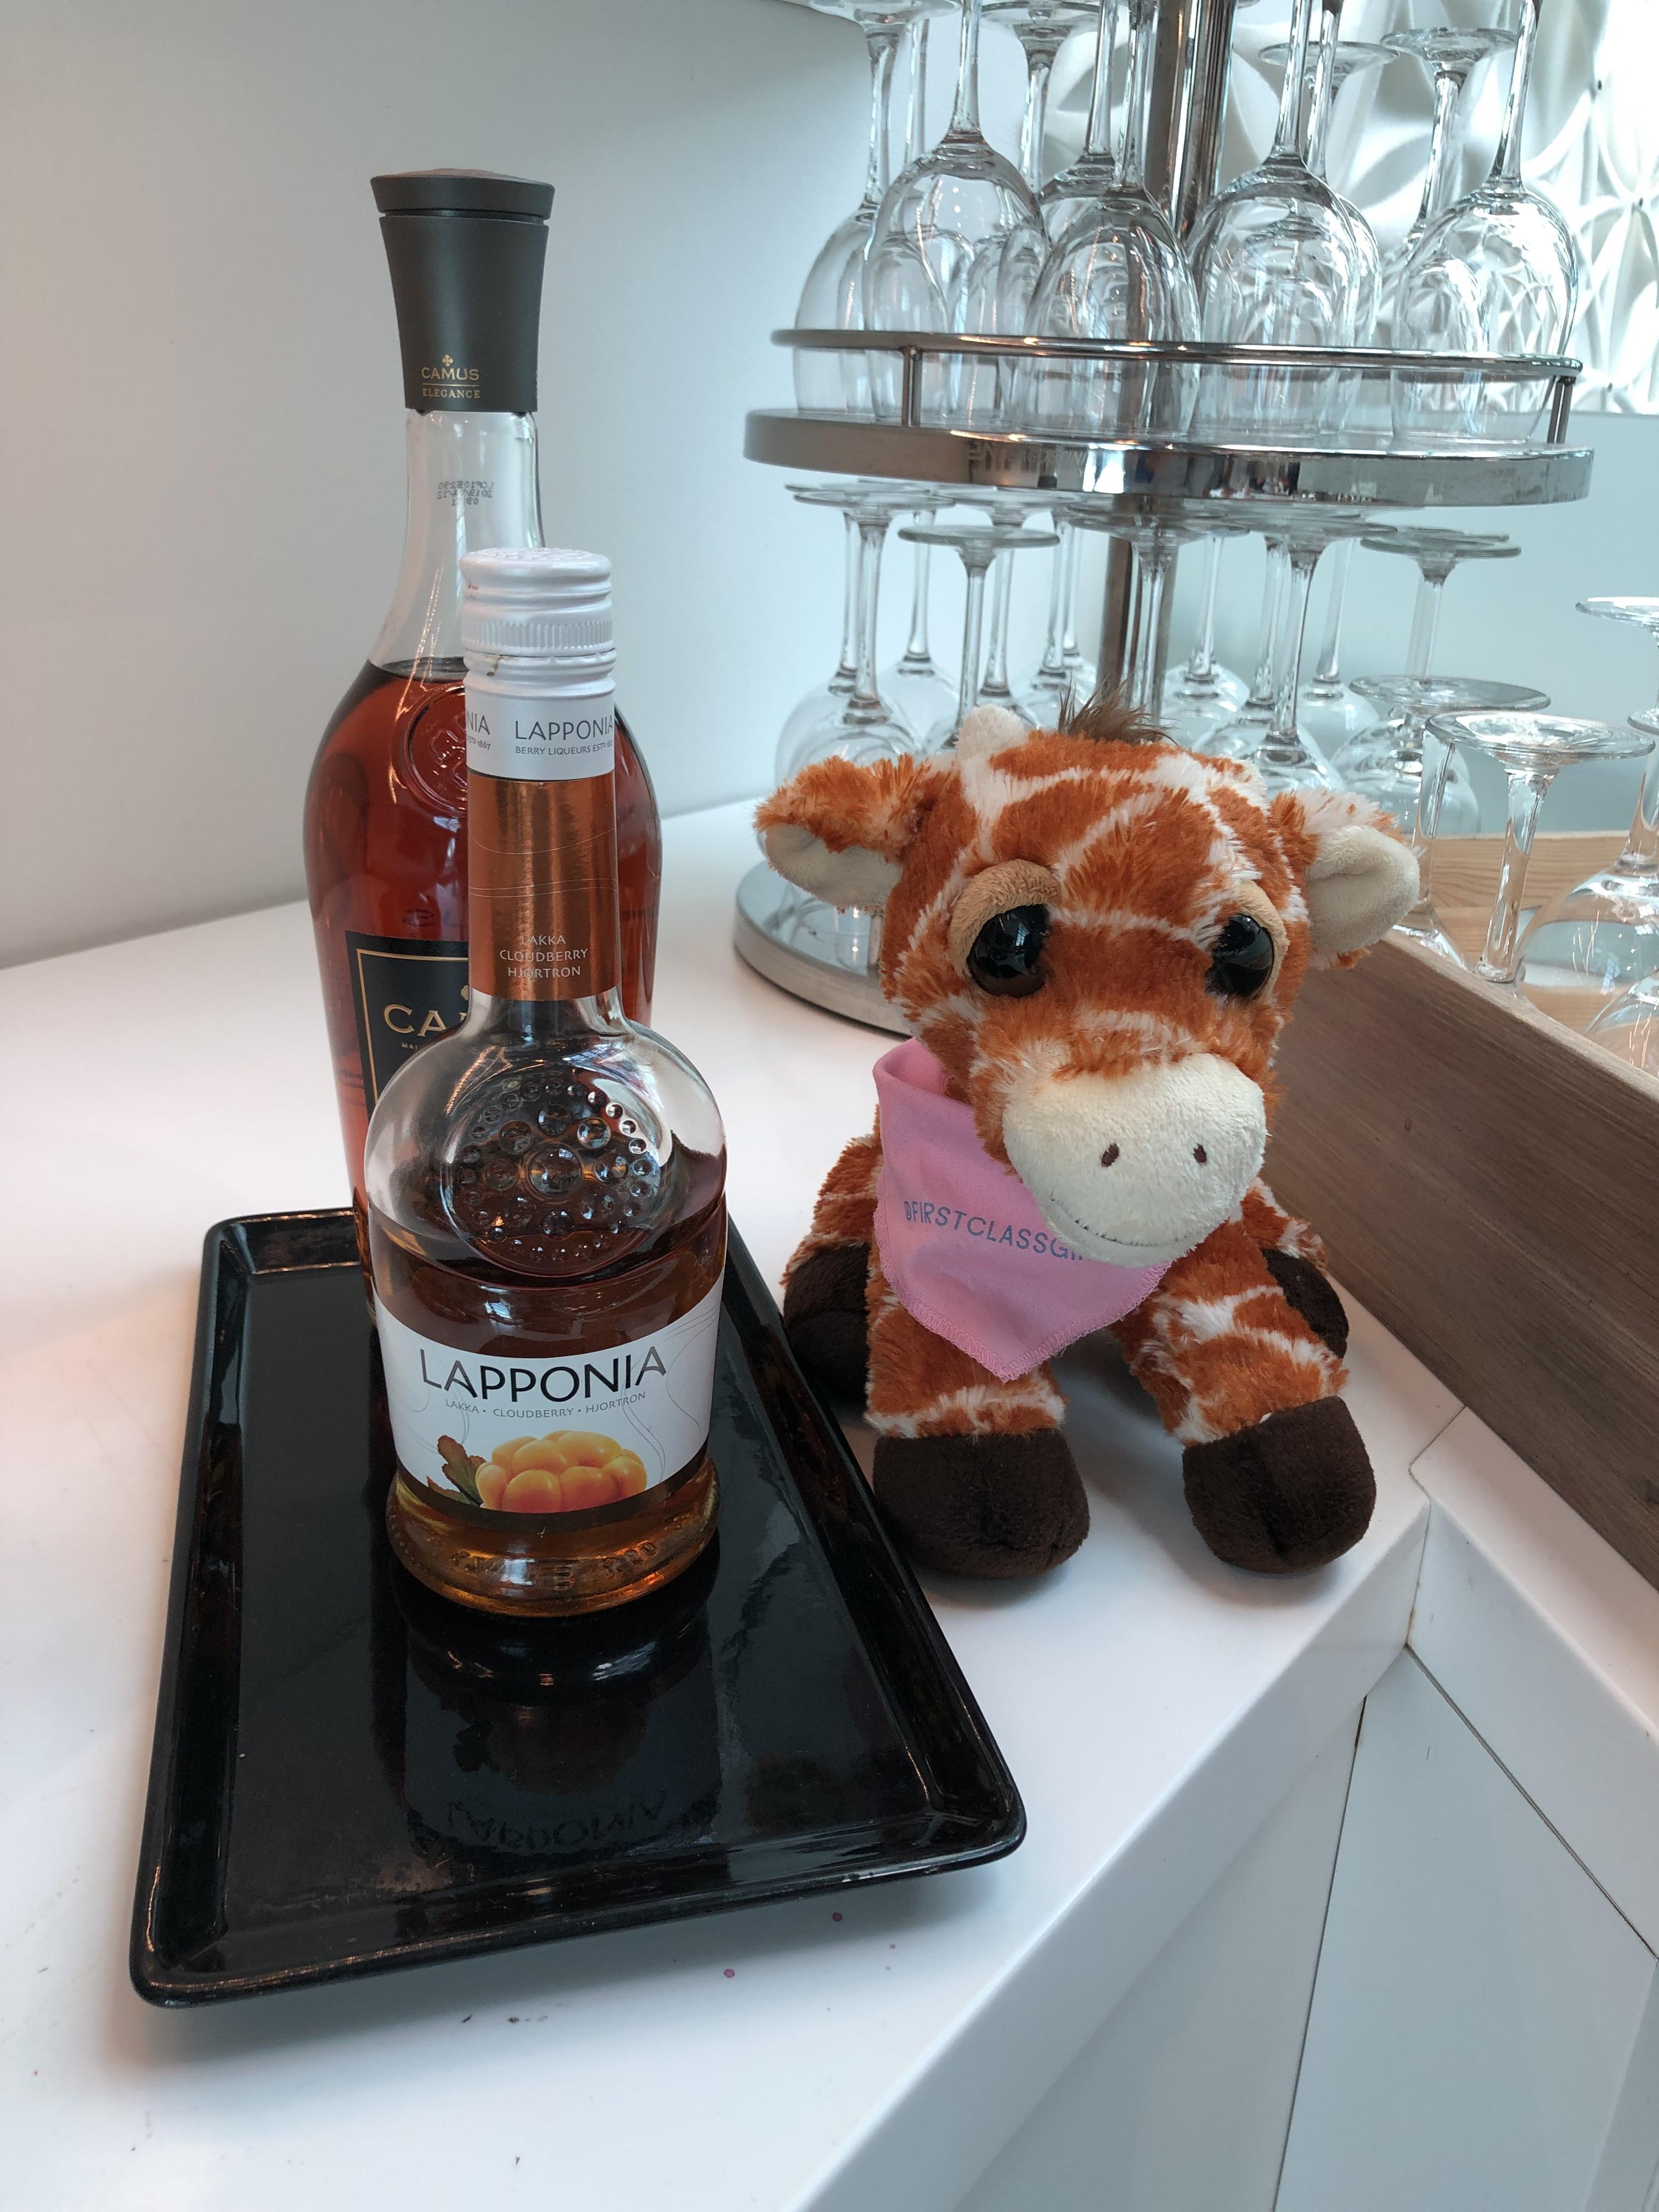 Finnair Business Class Lounge Helsinki Lapponia cloudberry liqueur